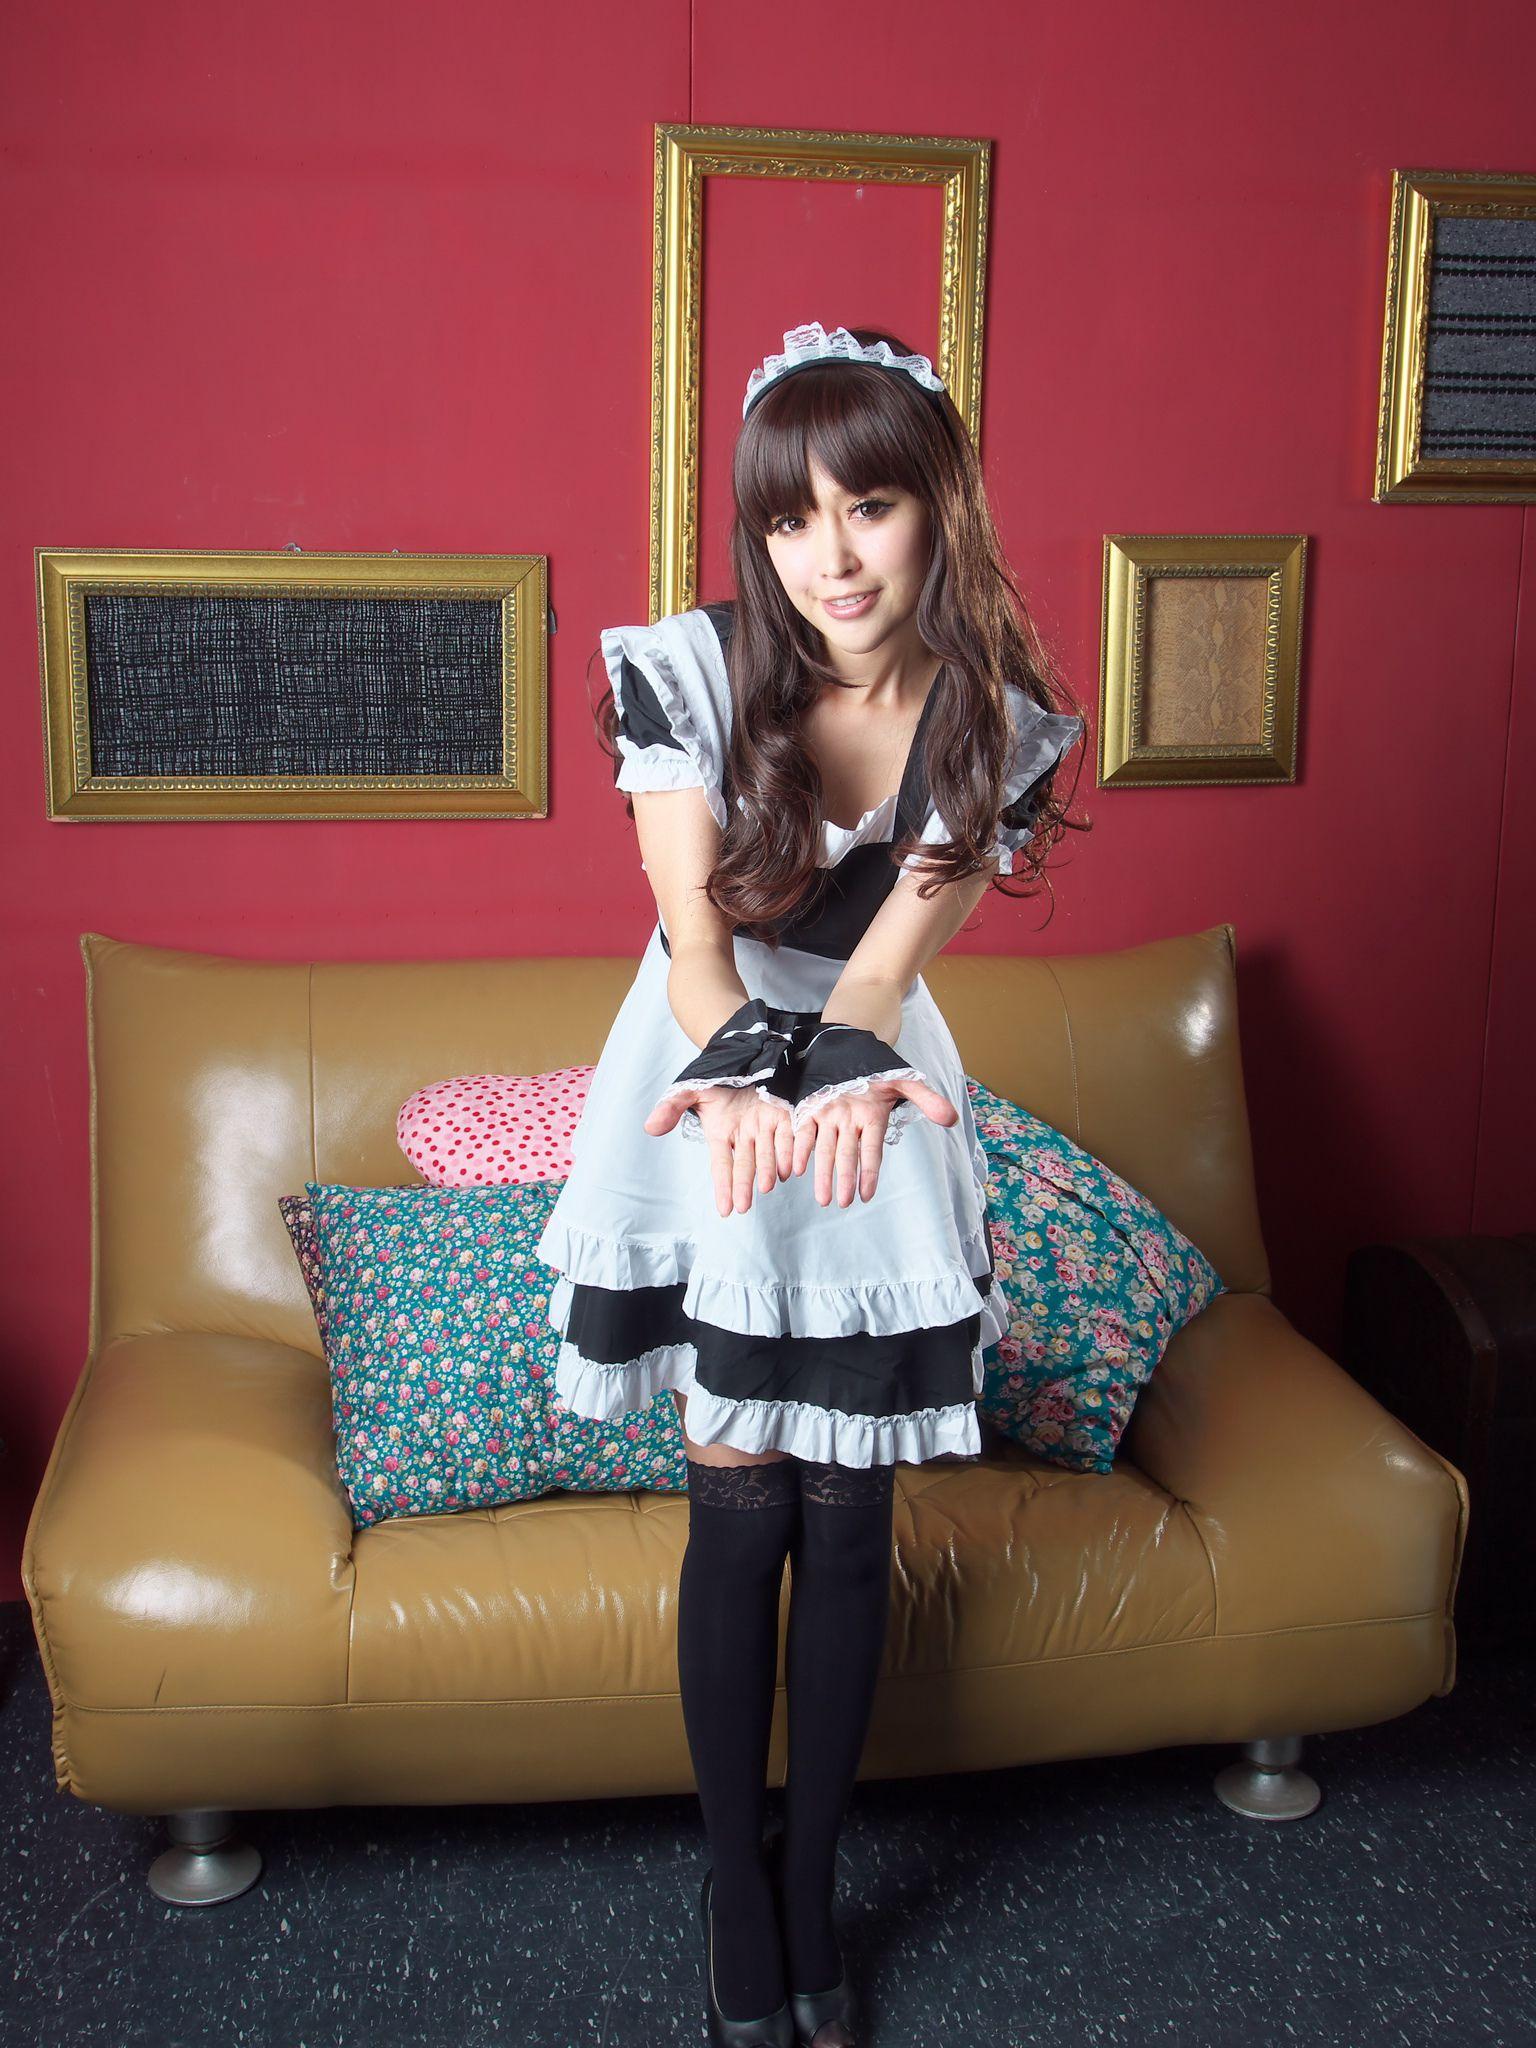 VOL.1514 [台湾正妹]长筒袜可爱女仆:杜可薇(腿模Avy,恬小鱼)高品质写真套图(35P)